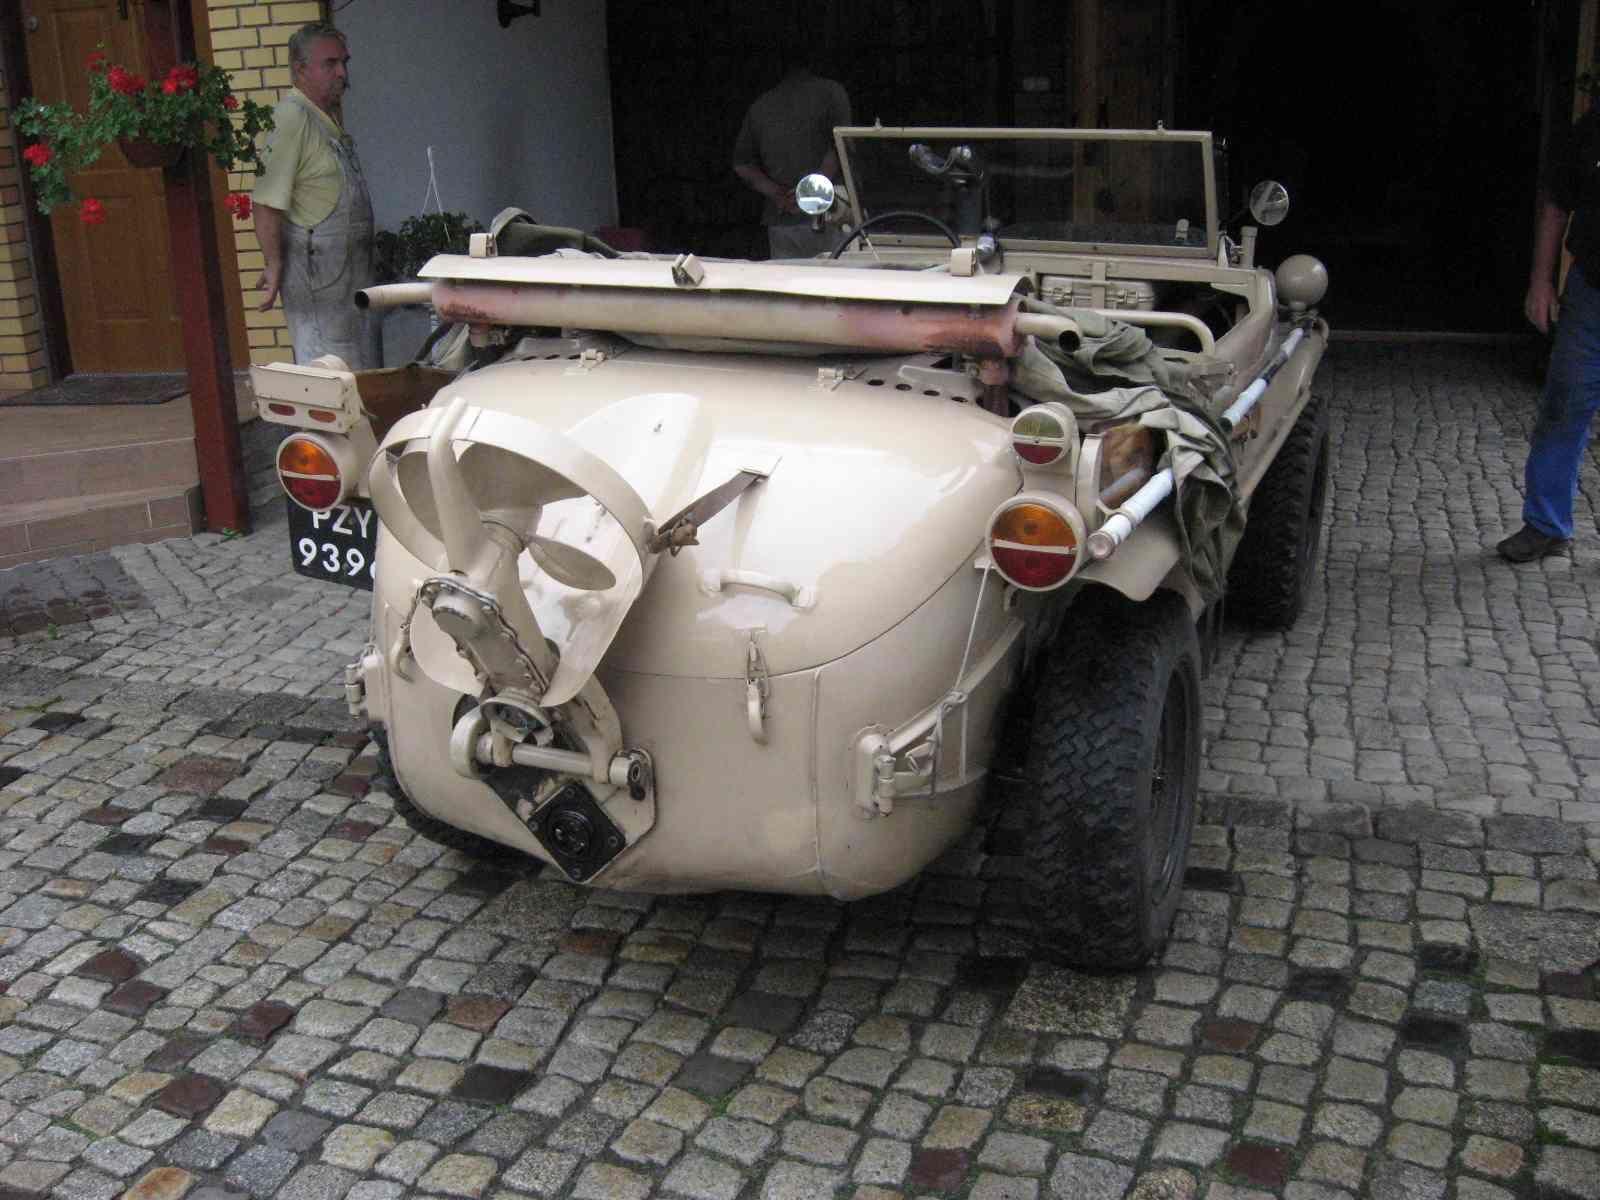 1943 Vw Schwimmwagen Wwii Amphibious Car For Sale